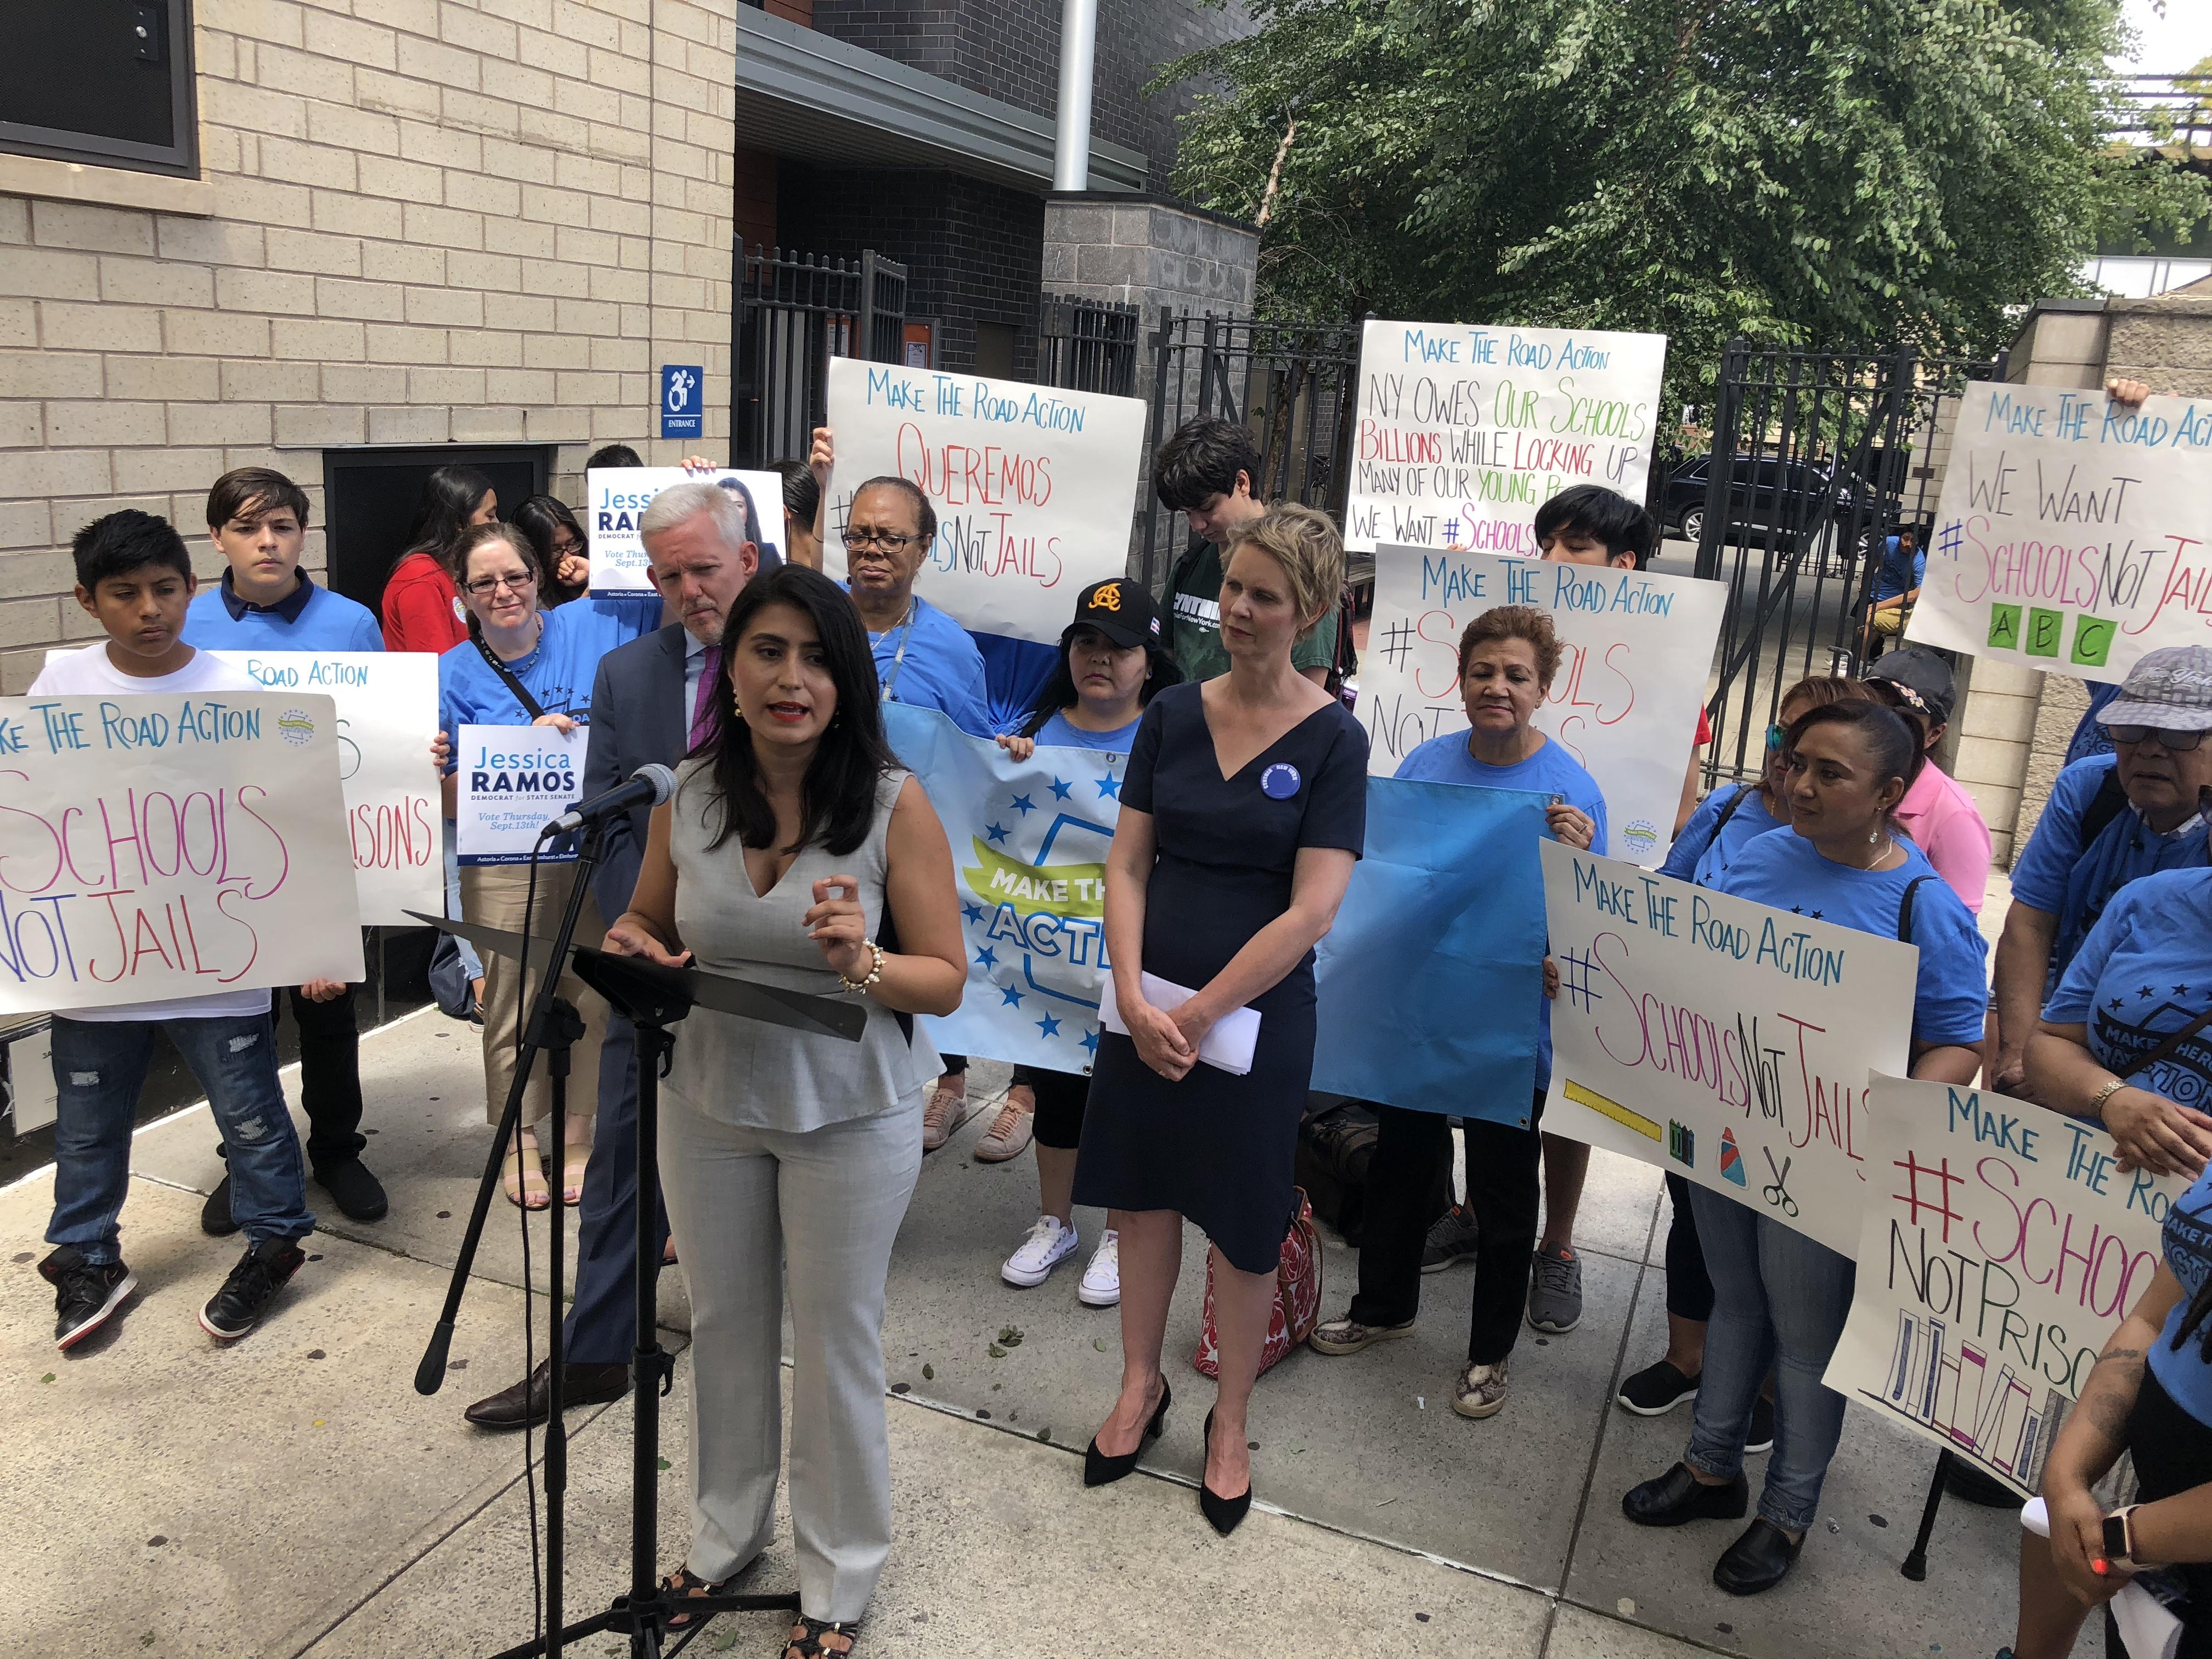 Jessica Ramos, candidata al Senado, junto a la candidata a gobernadora Cynthia Nixon, el concejal Jimmy Van Bramer y madres de estudiantes.